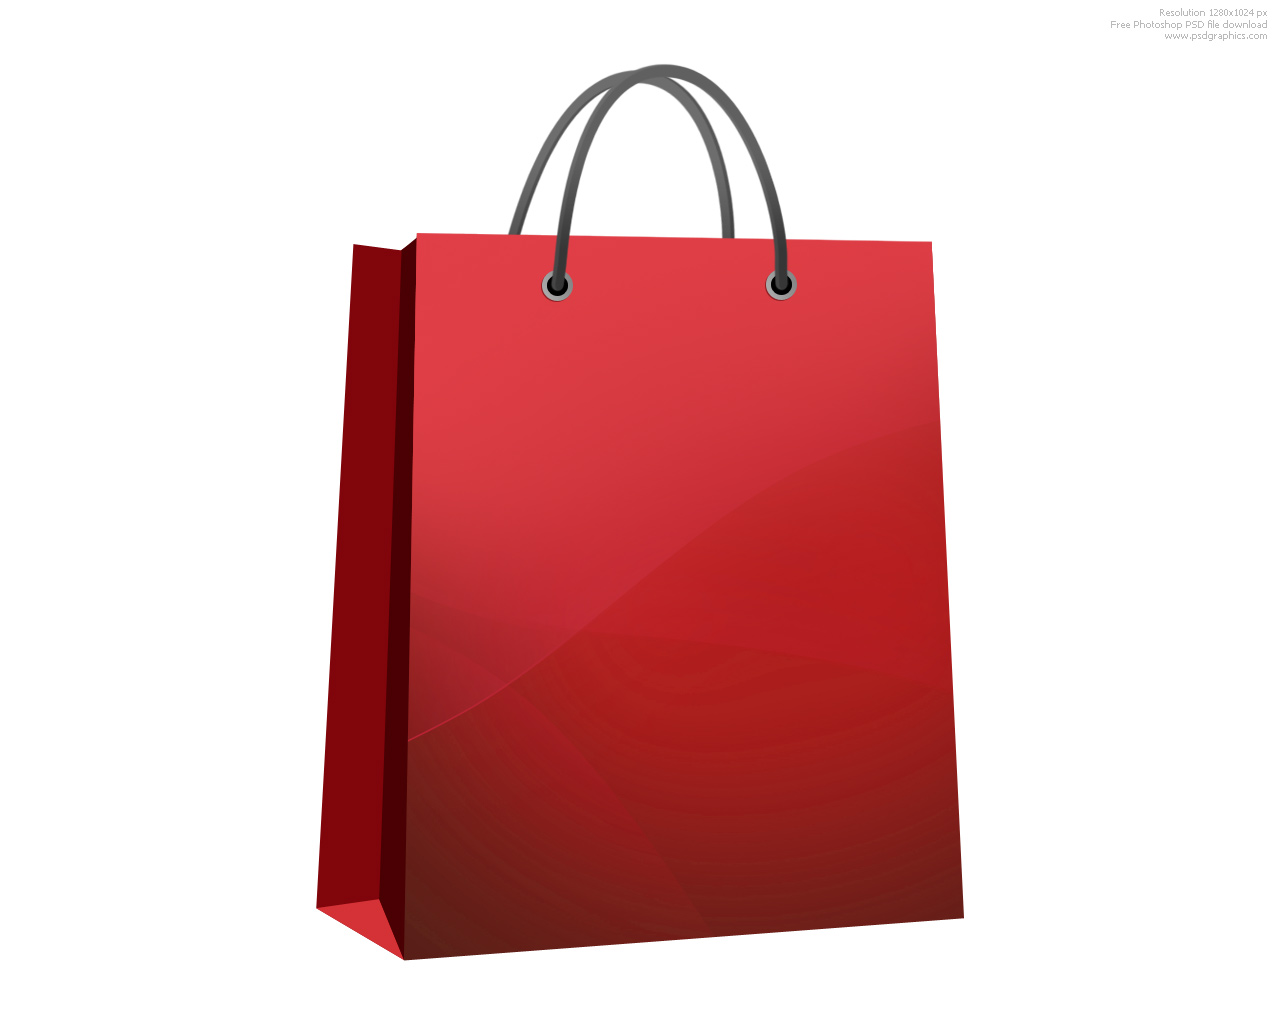 RoyaltyFree RF Black Shopping Bag Clipart